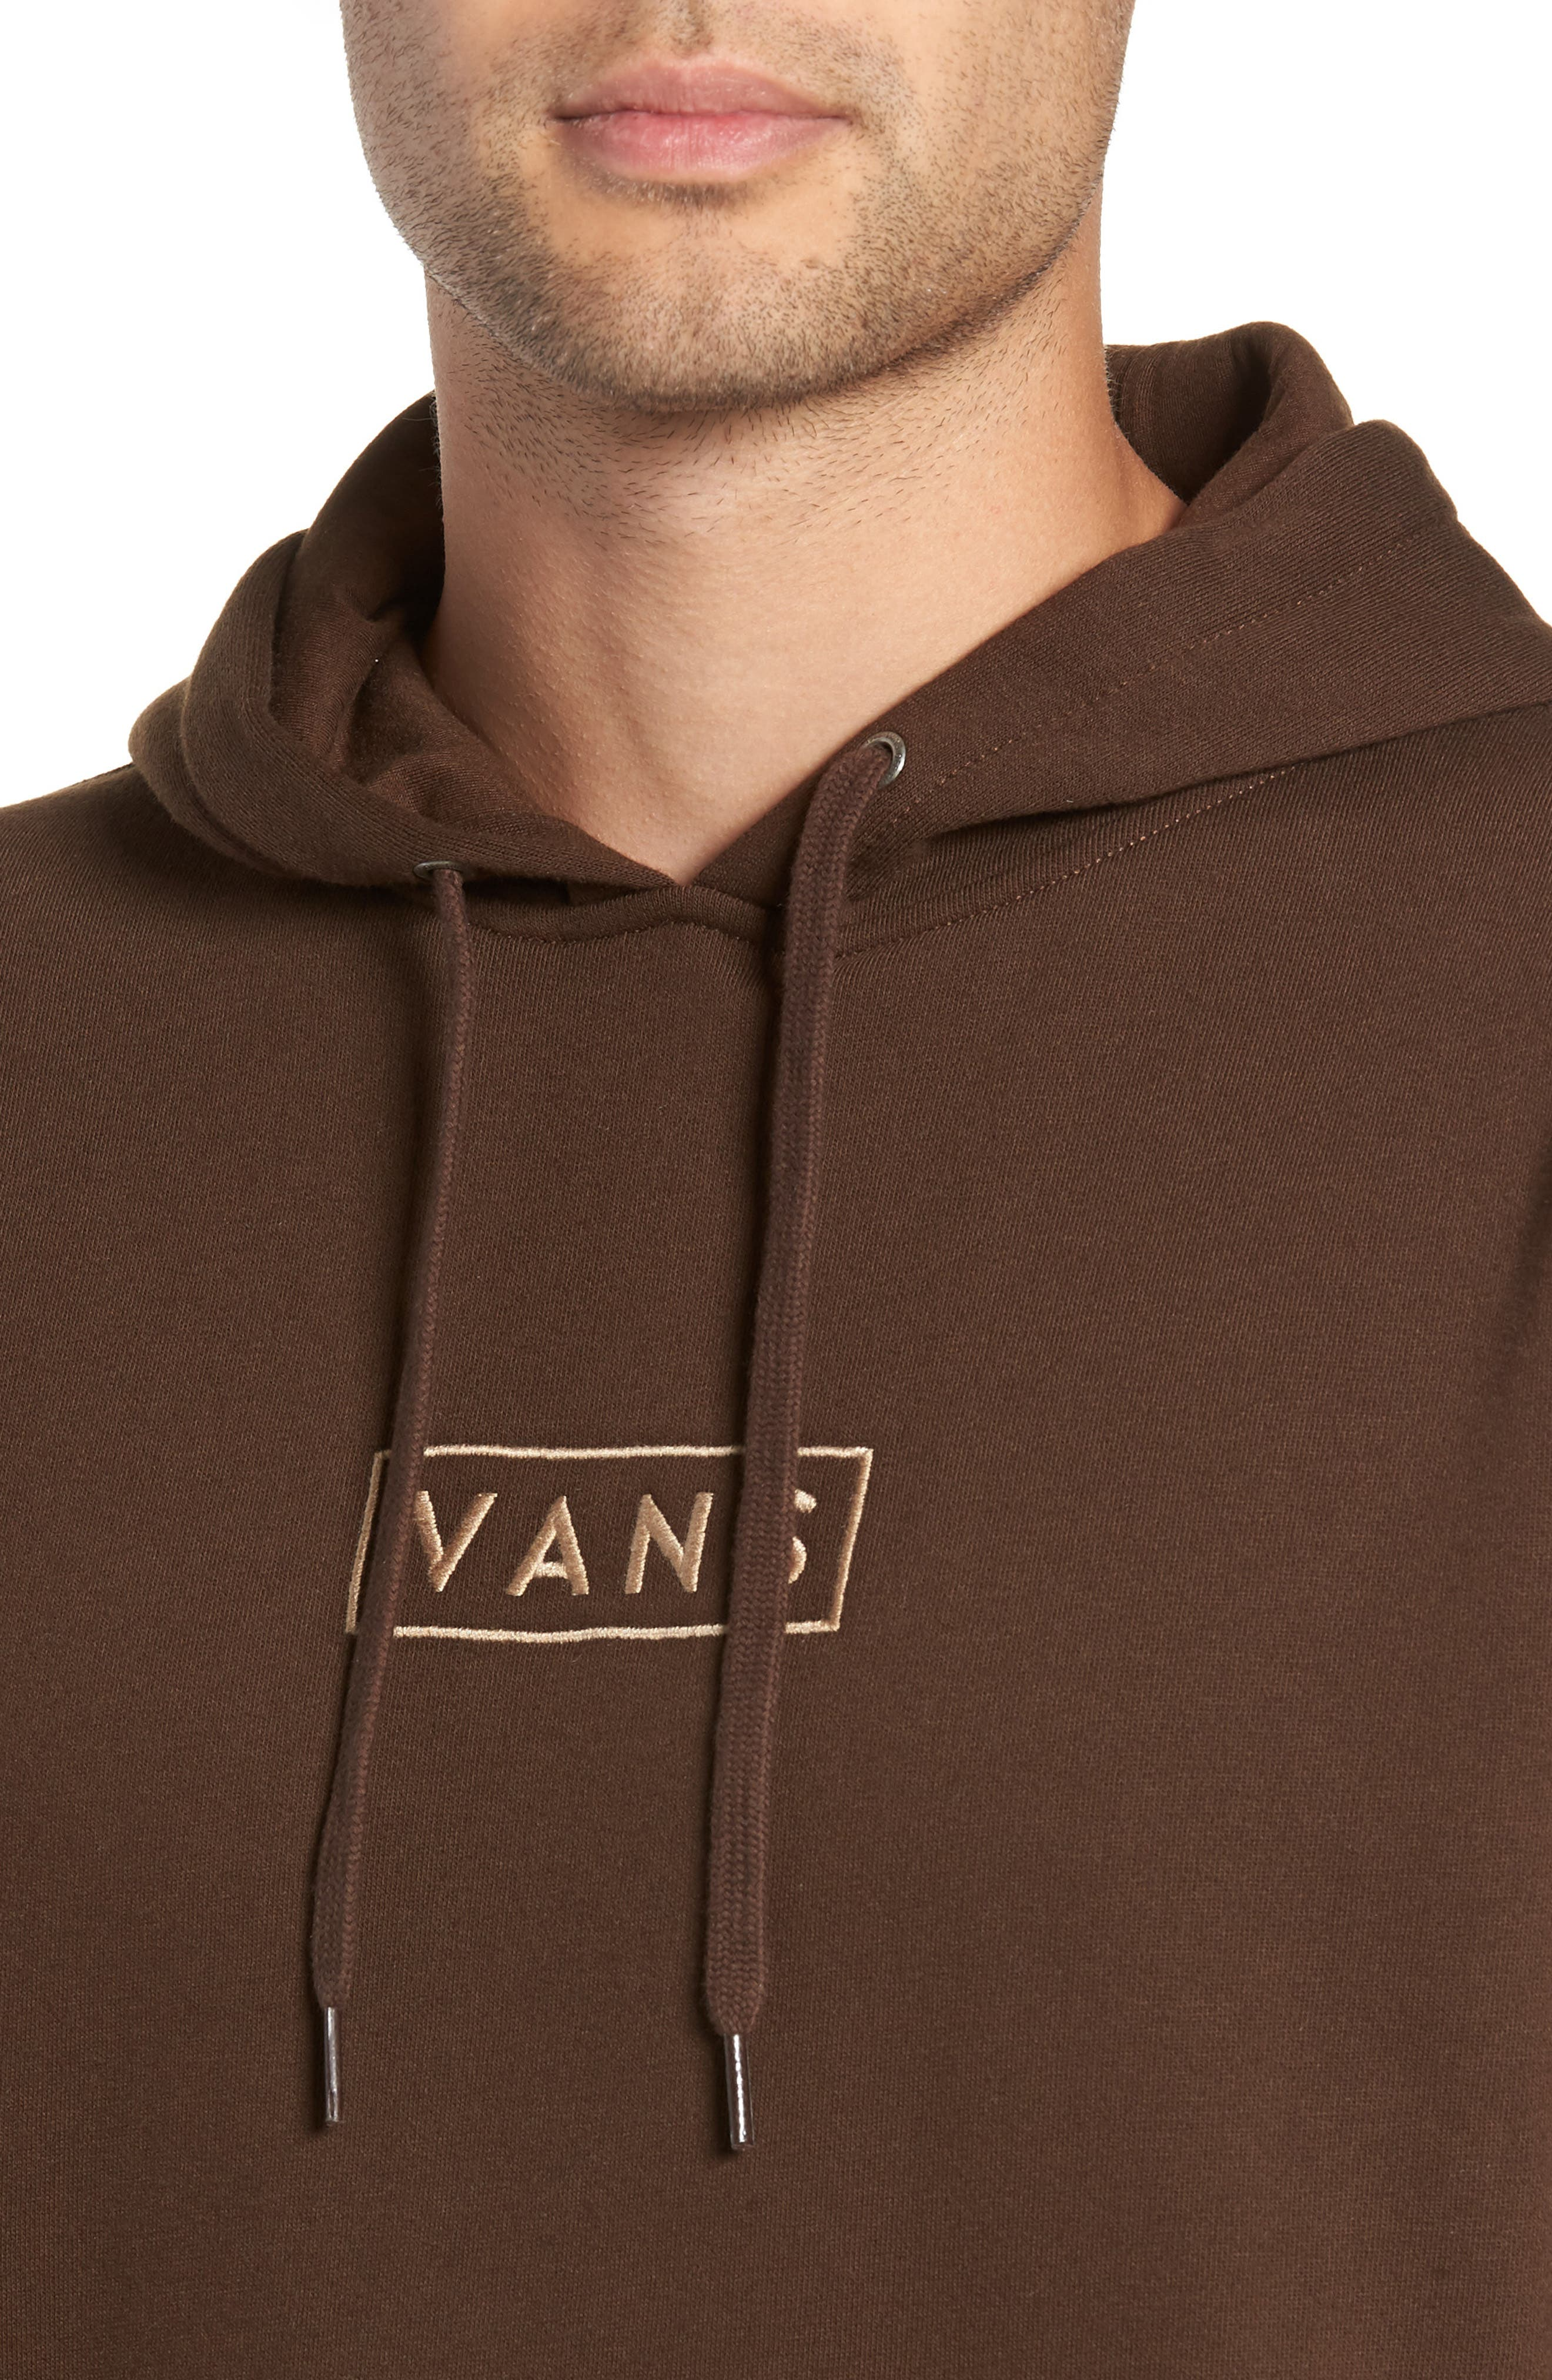 Easy Box Embroidered Hooded Sweatshirt,                             Alternate thumbnail 4, color,                             DEMITASSE